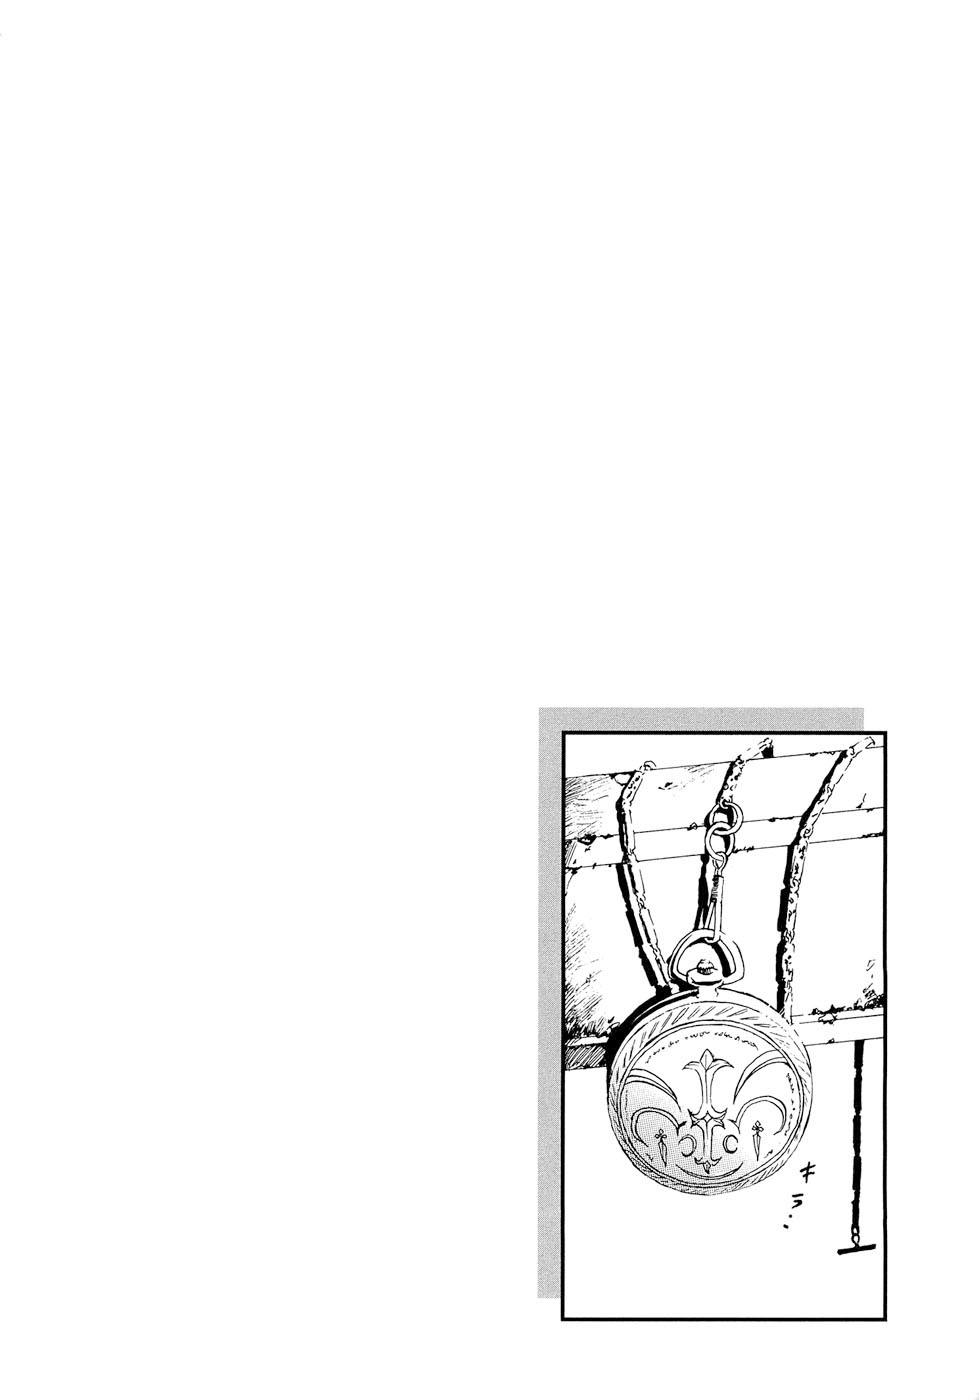 Pandora Hearts chương 004 - retrace: iv rendezvous trang 4